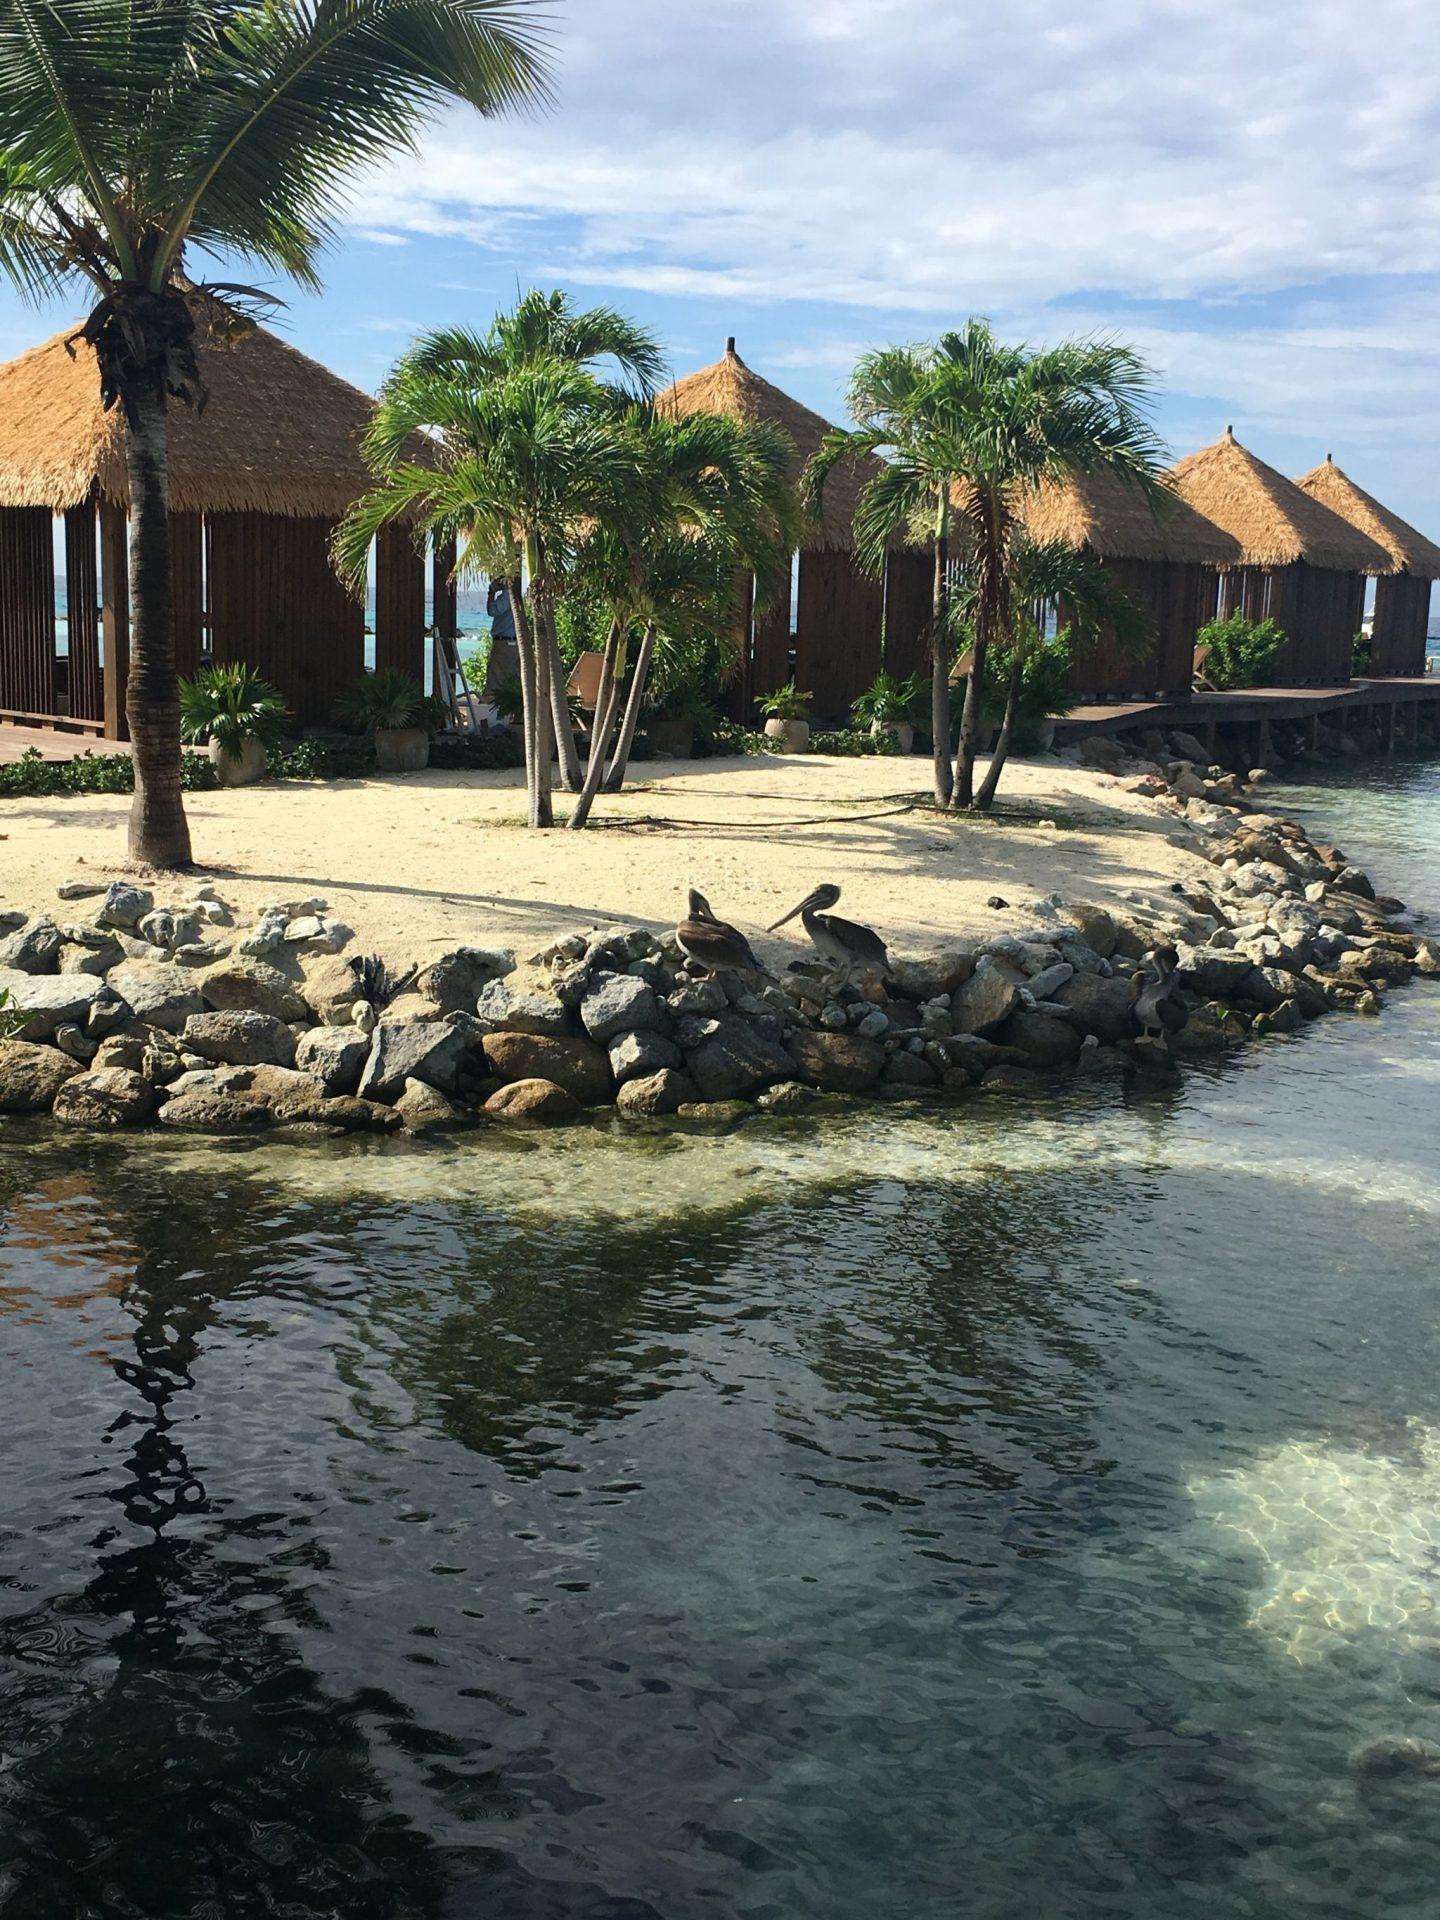 Aruba's flamingo island